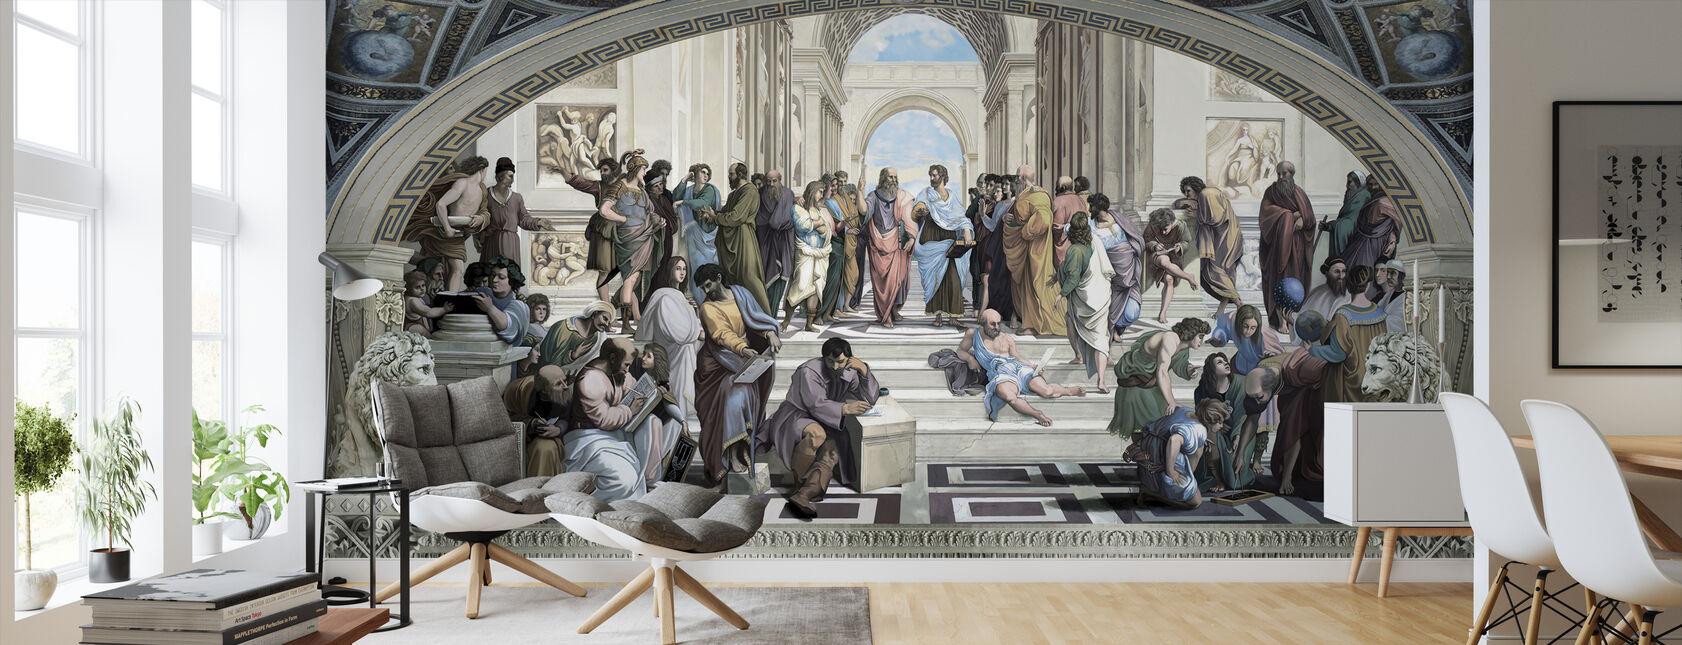 Athens School - Wallpaper - Living Room